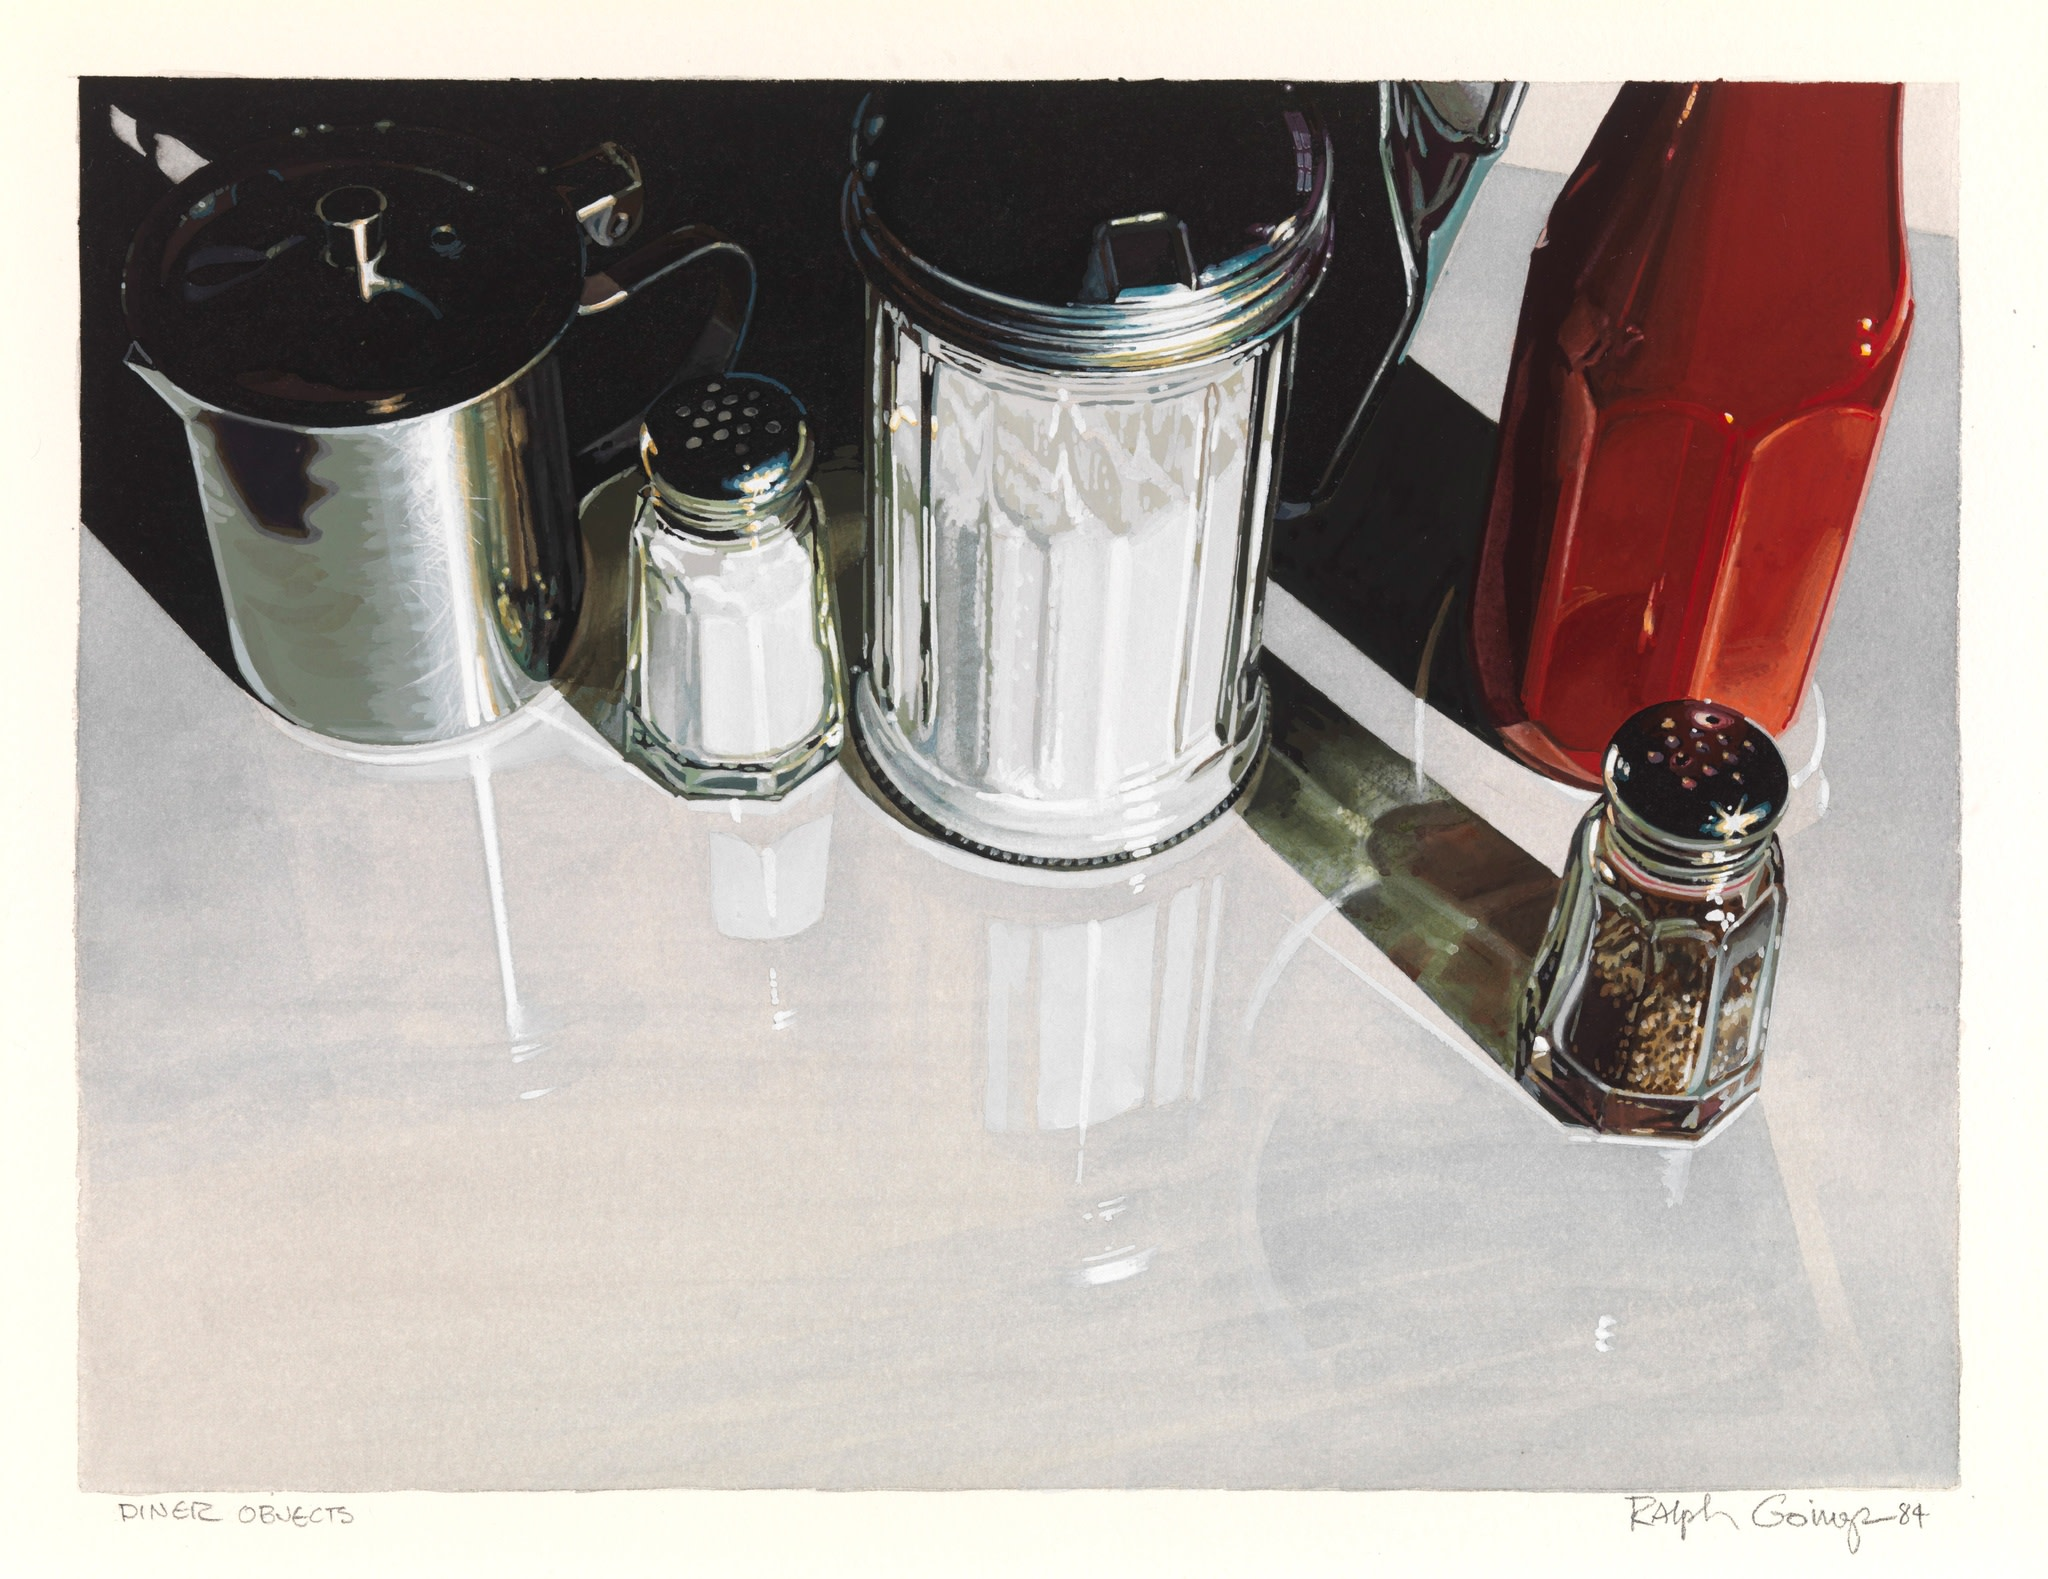 <span class=&#34;link fancybox-details-link&#34;><a href=&#34;/artists/113-ralph-goings/works/745/&#34;>View Detail Page</a></span><div class=&#34;artist&#34;><strong>Ralph Goings</strong></div> <div class=&#34;title&#34;><em>Diner Objects</em></div> <div class=&#34;medium&#34;>Gouache on paper</div> <div class=&#34;dimensions&#34;>9&#34; x 12&#34; or 22.8 x 30.5 cm </div>